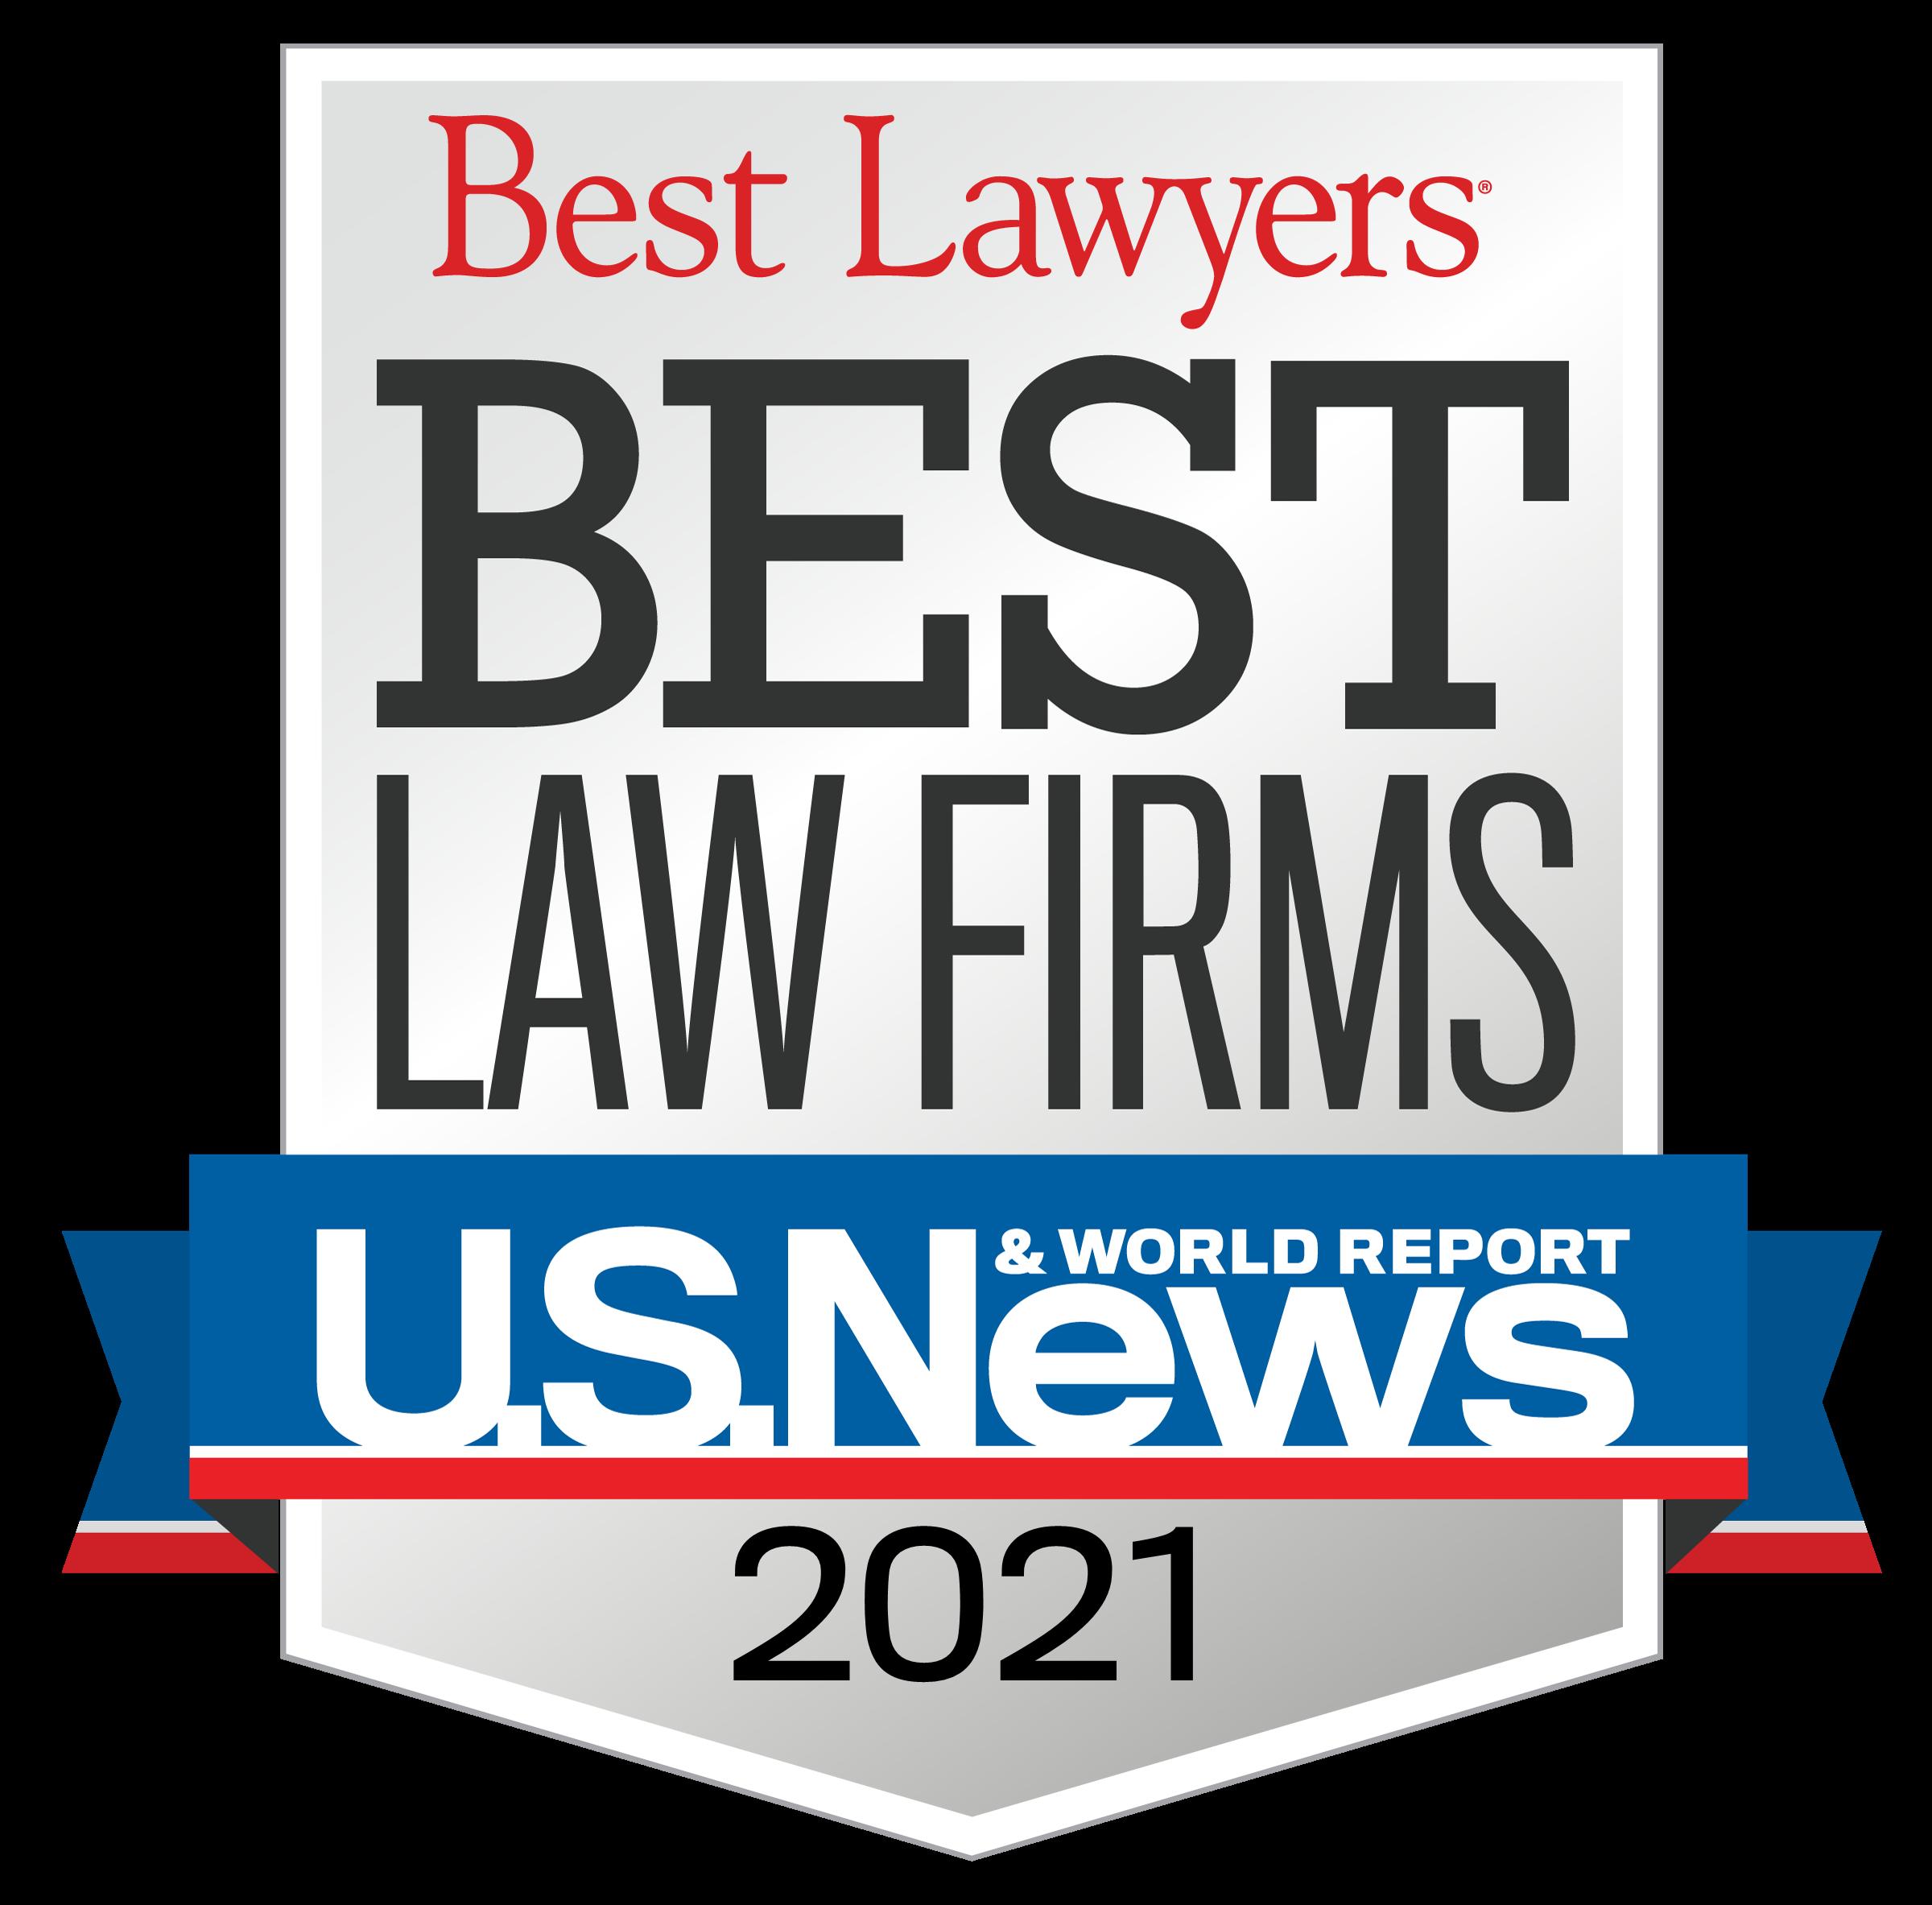 Best-Law-Firms-Standard-Badge-1